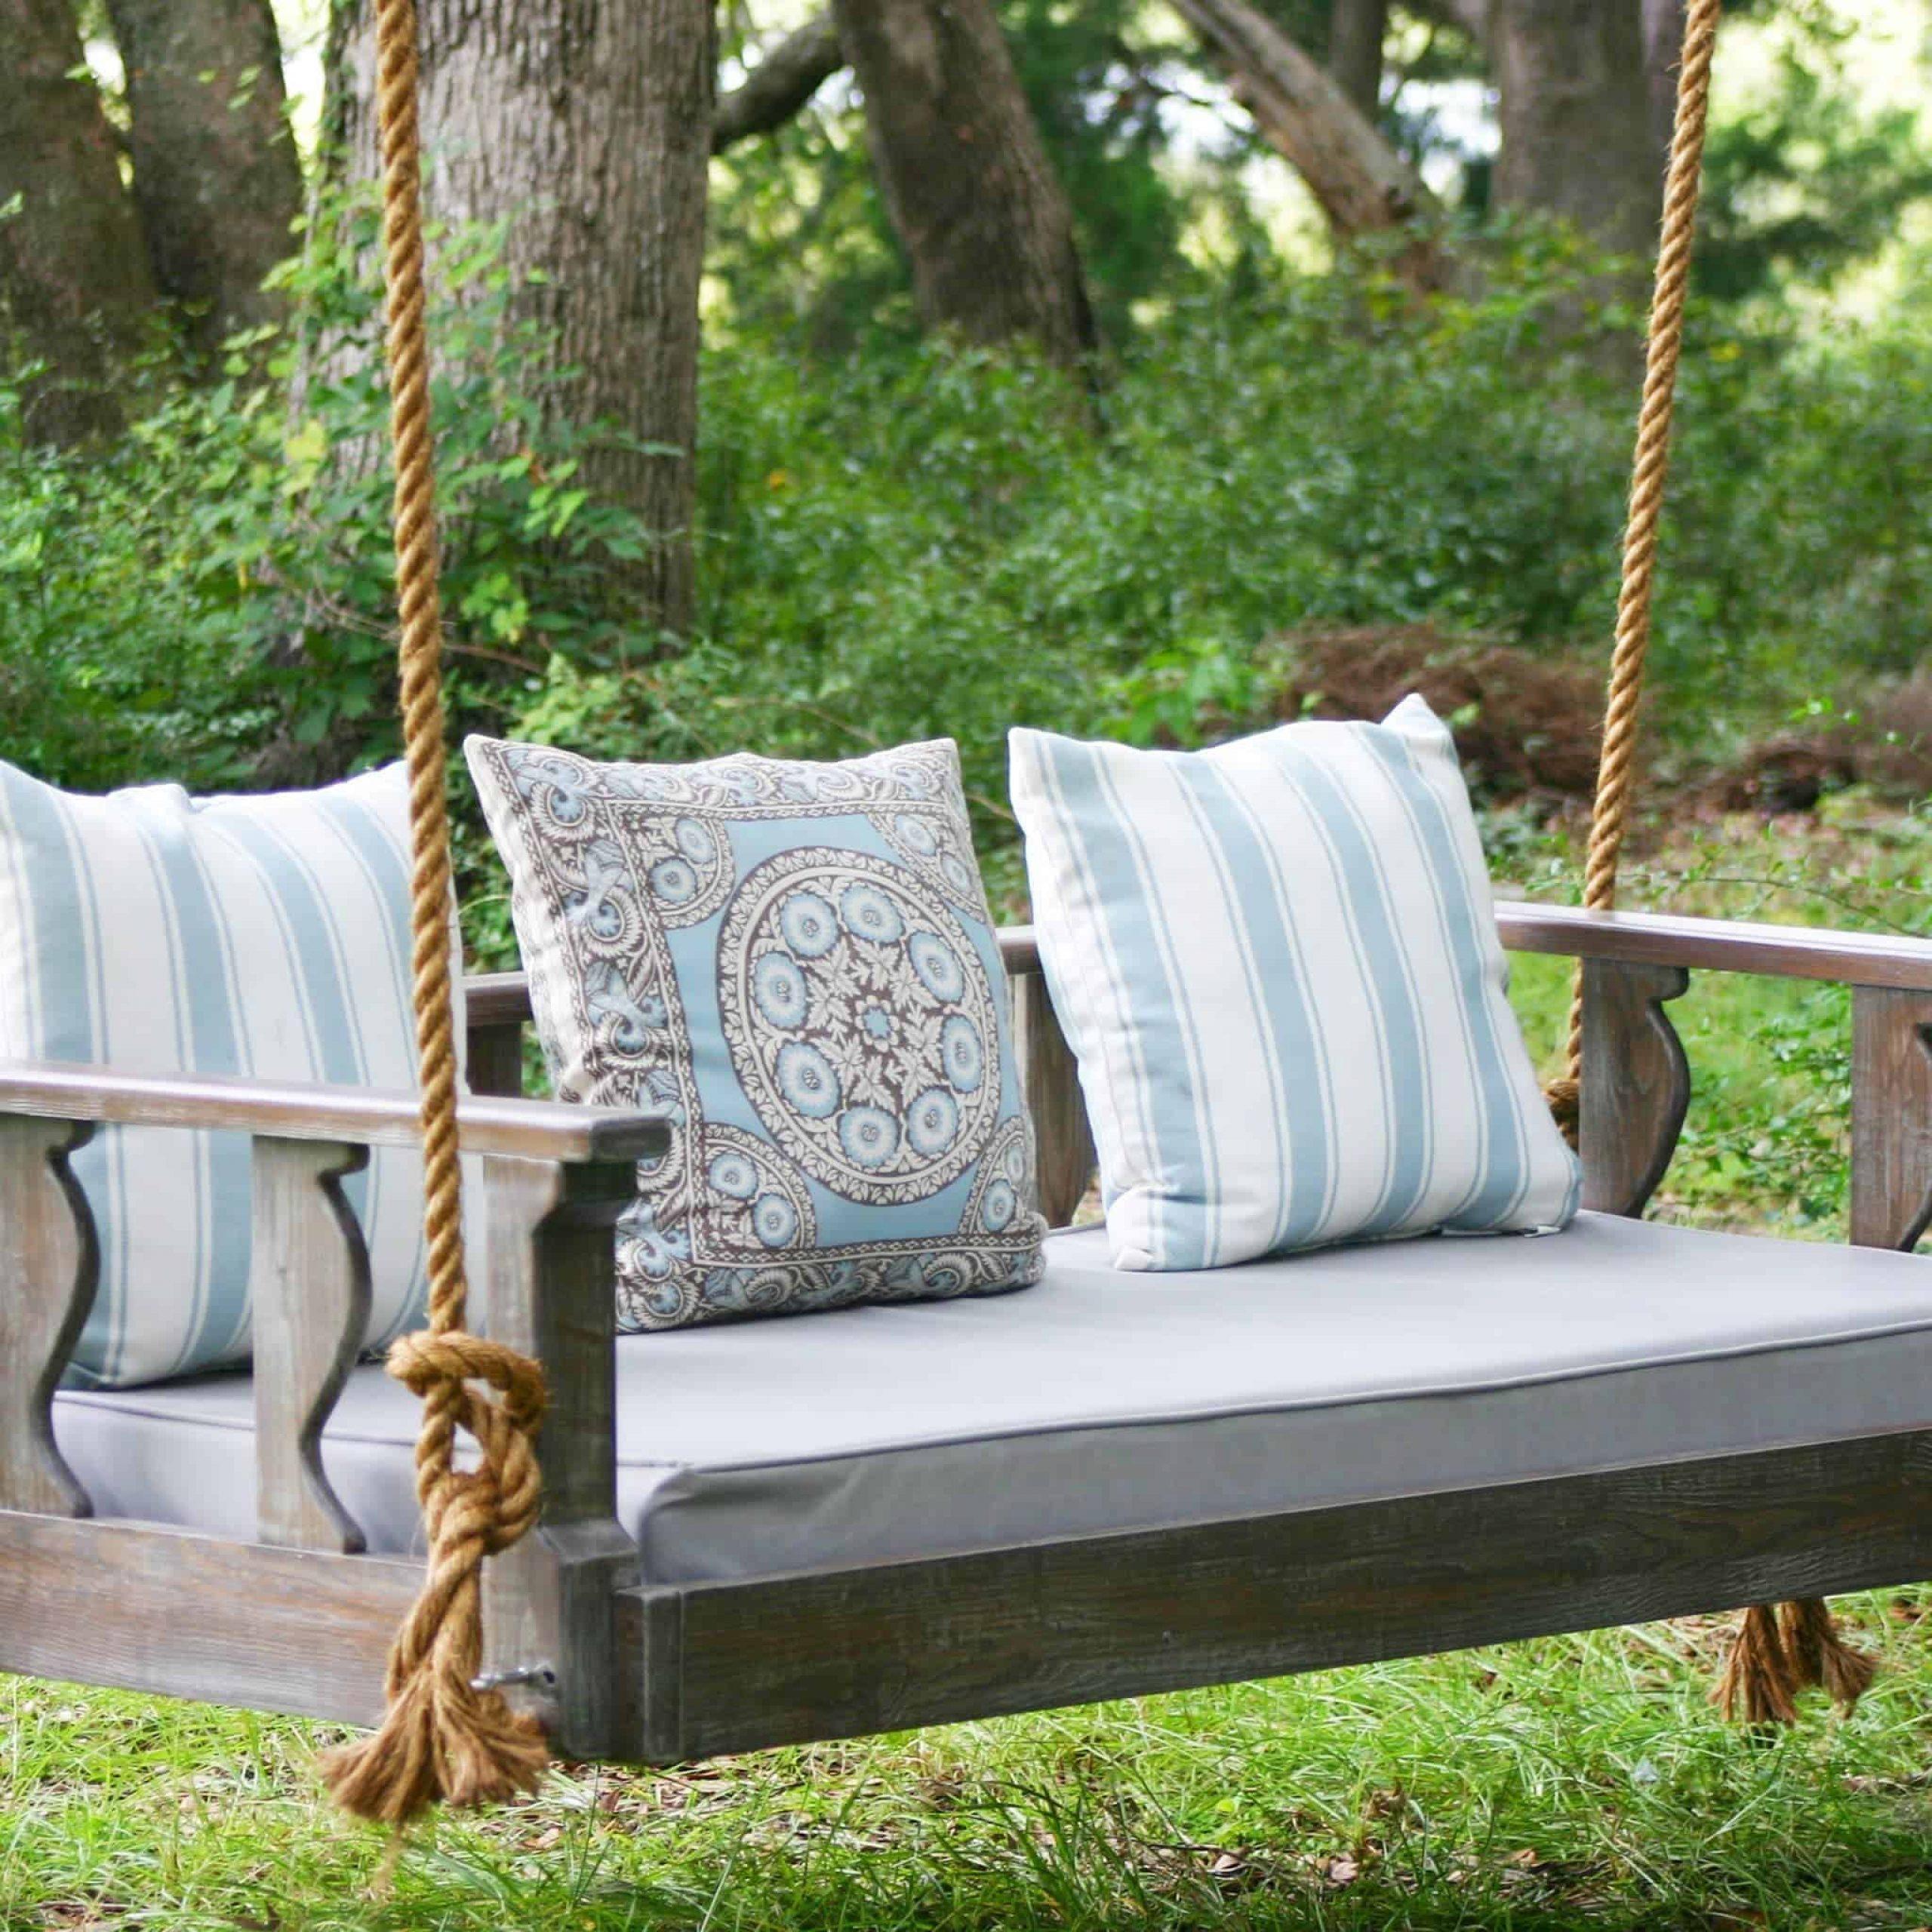 Bed Swings And Porch Swings, Handmadevintage Porch Swings In Plain Porch Swings (View 4 of 25)